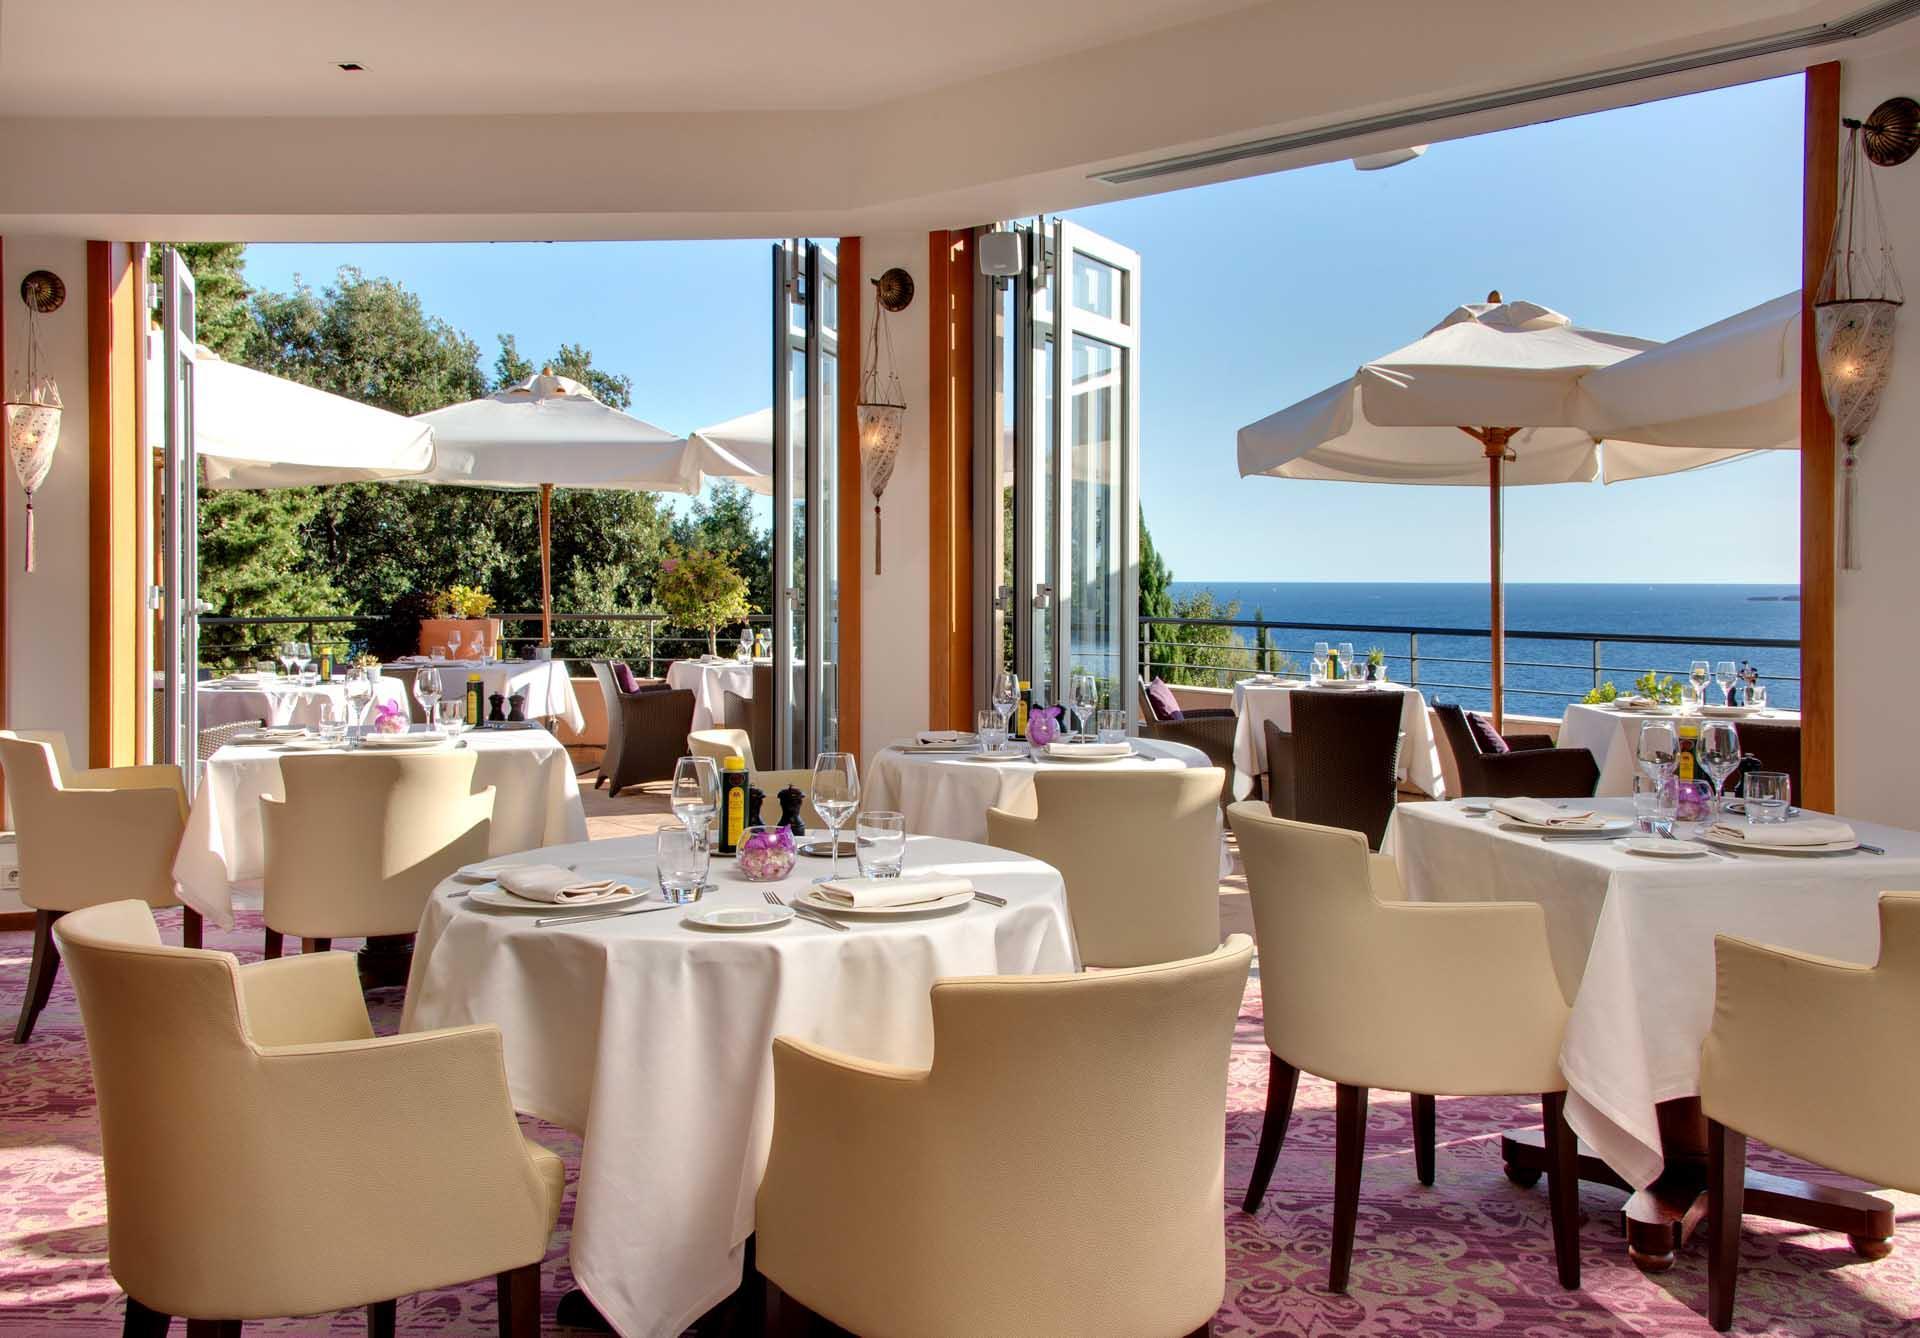 La salle du restaurant l'Or Bleu au Tiara Yaktsa © DR